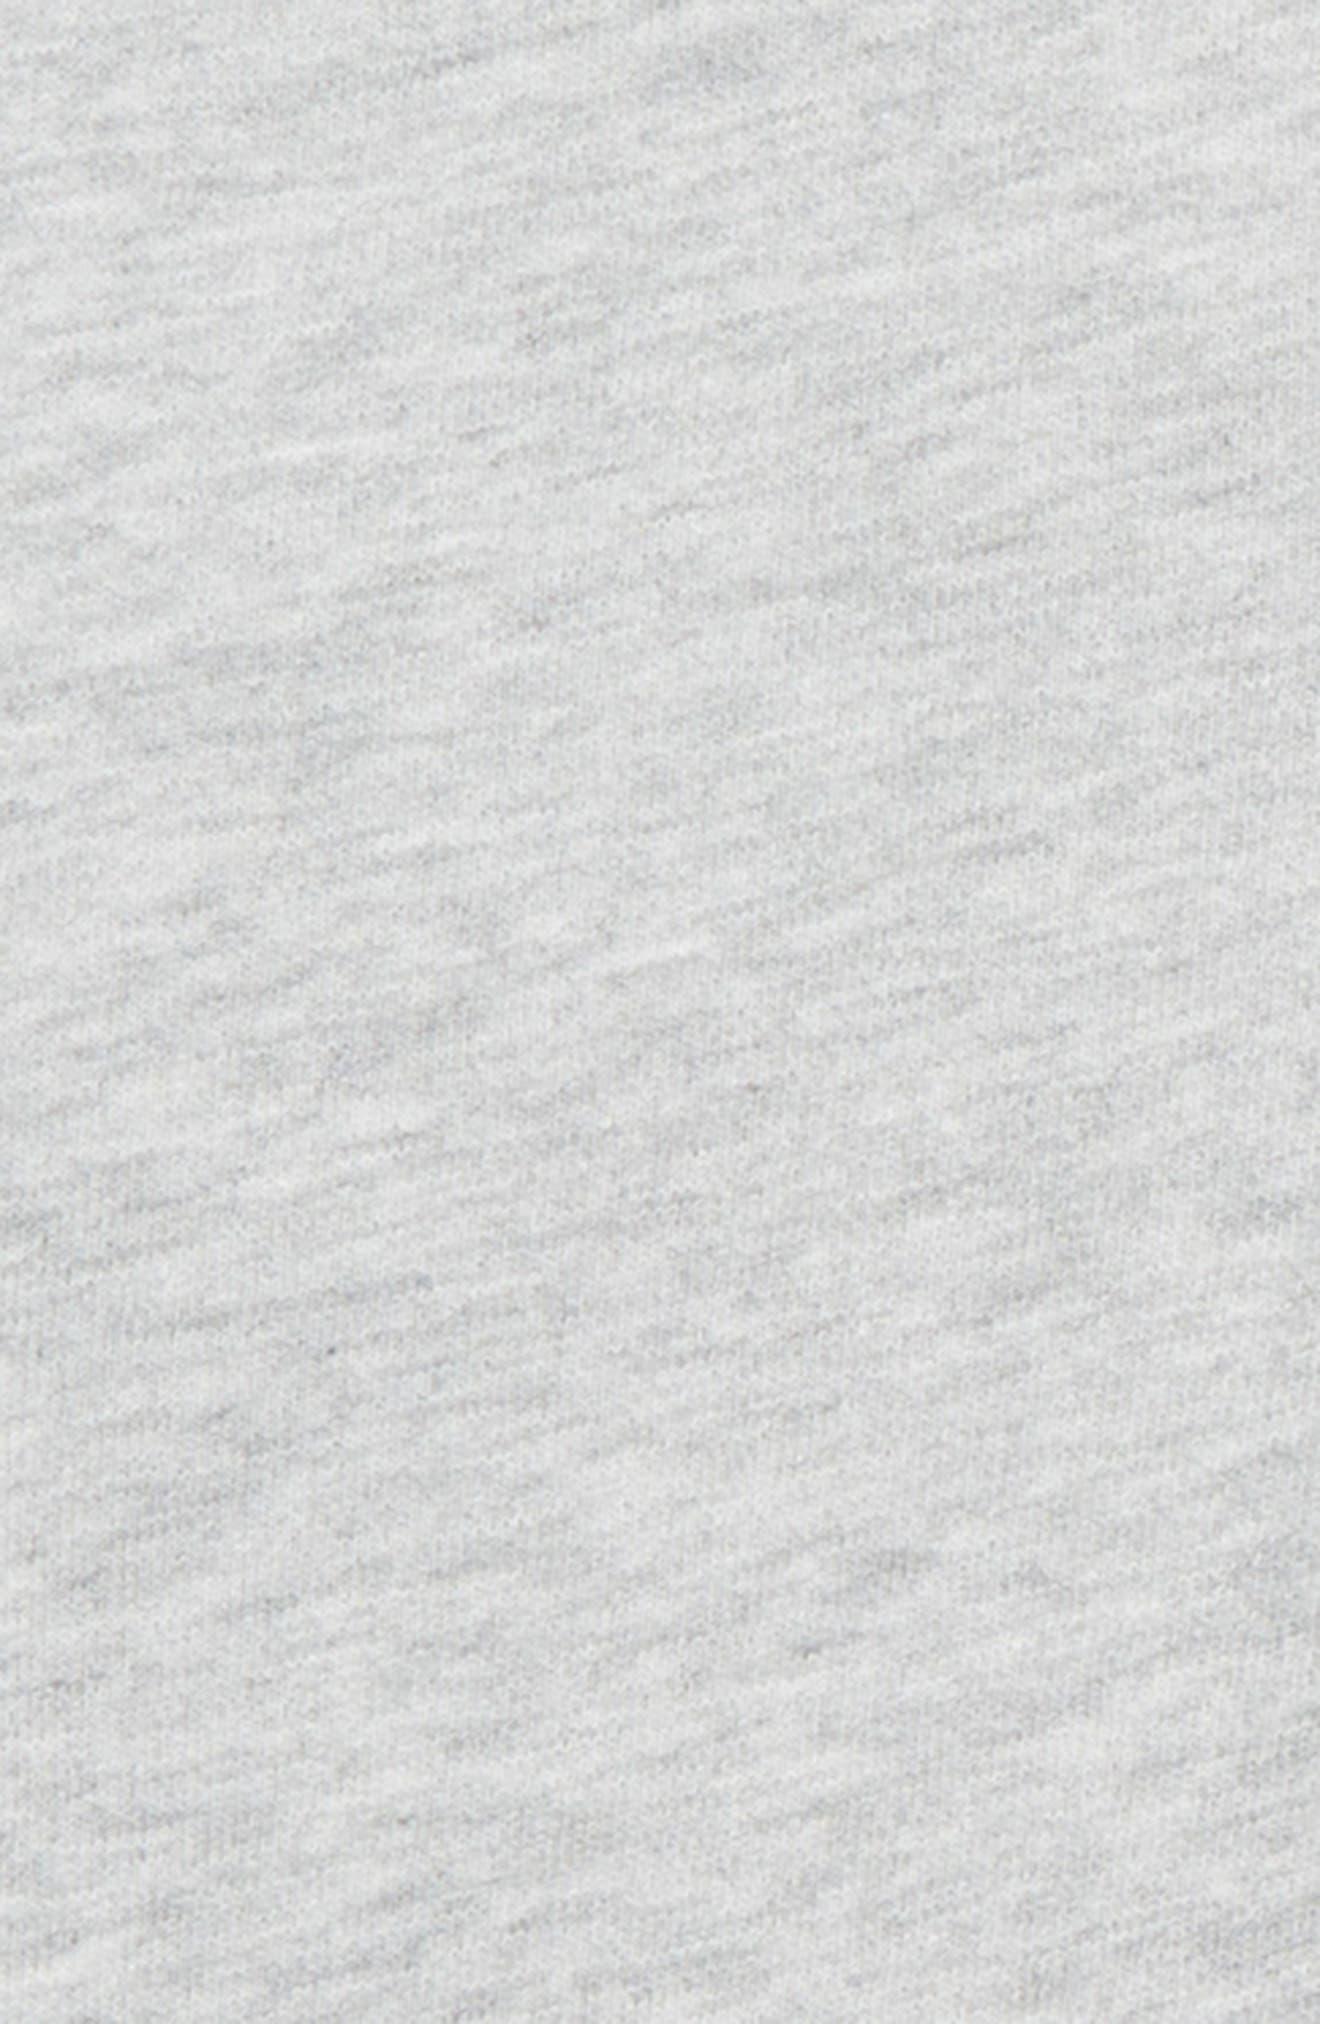 VINEYARD VINES, Go Knit Jogger Sweatpants, Alternate thumbnail 3, color, MEDIUM HEATHER GRAY